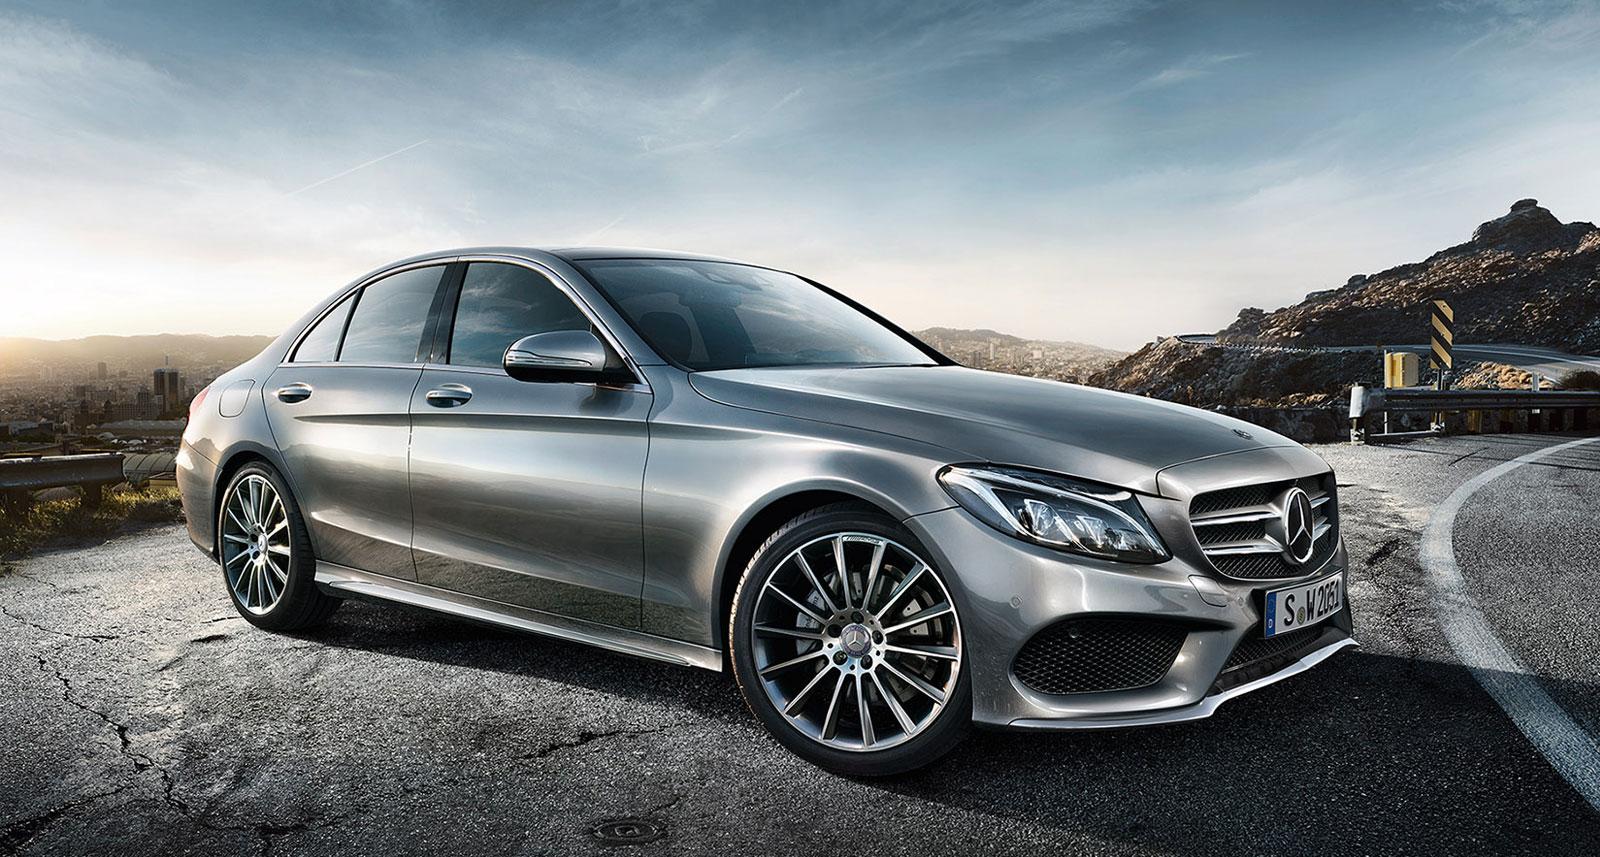 Mercedes On Lease - Web Designers Torquay Devon